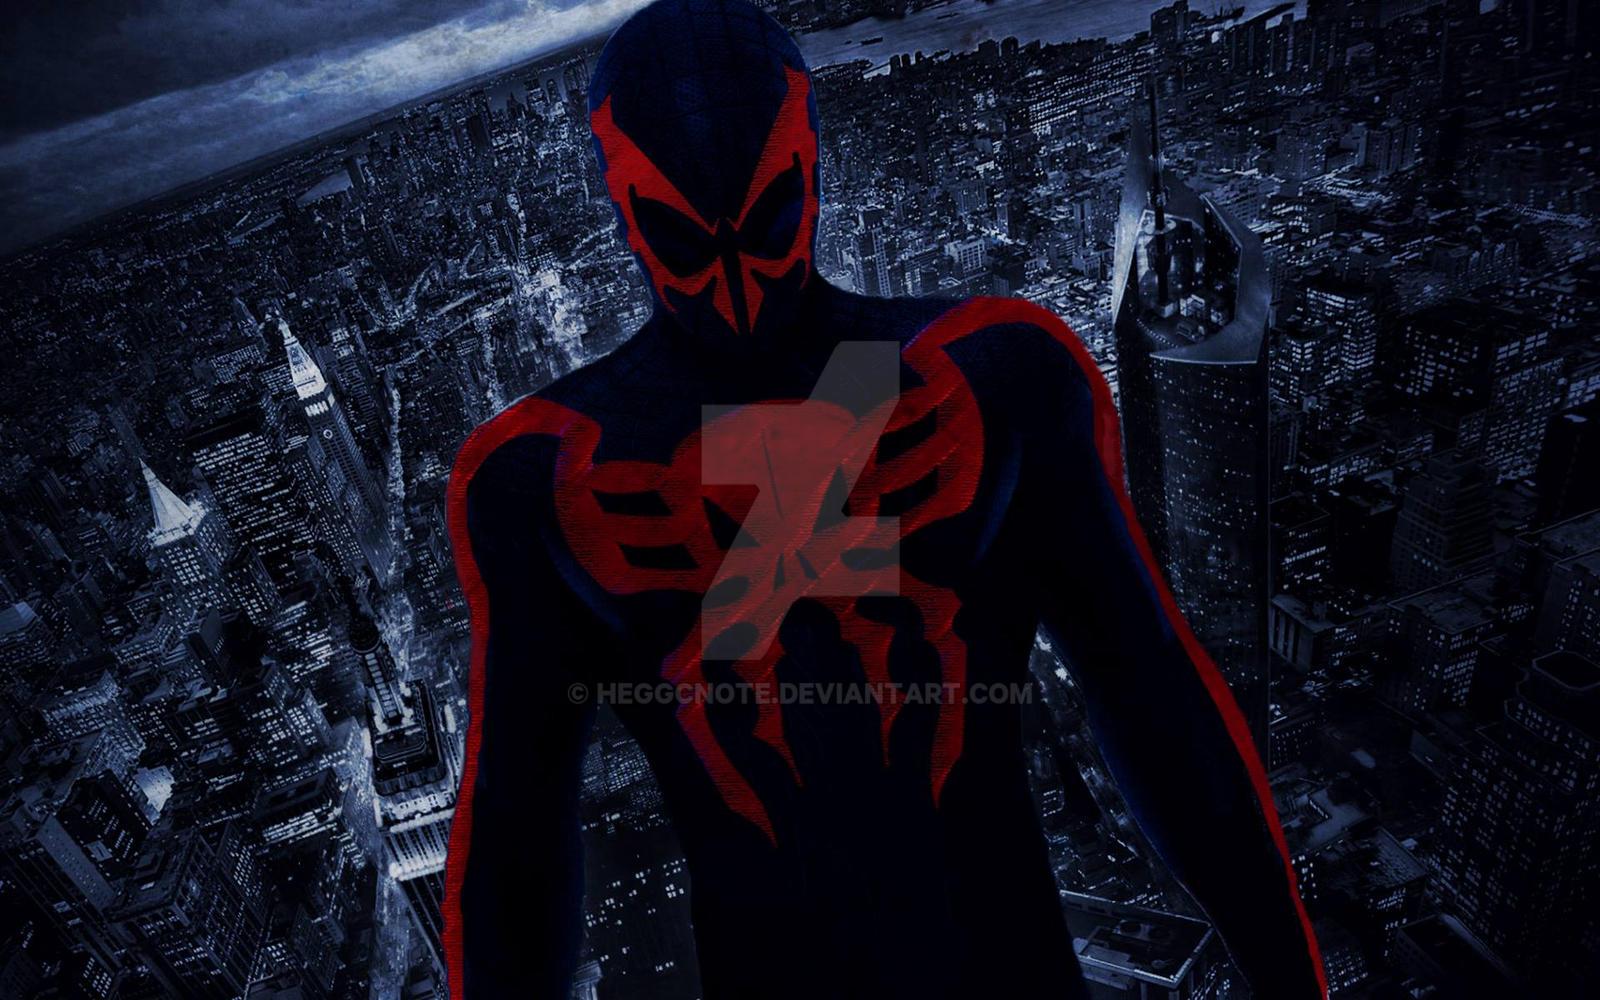 Amazing Spider-man 2099 Edit By Heggcnote On DeviantArt